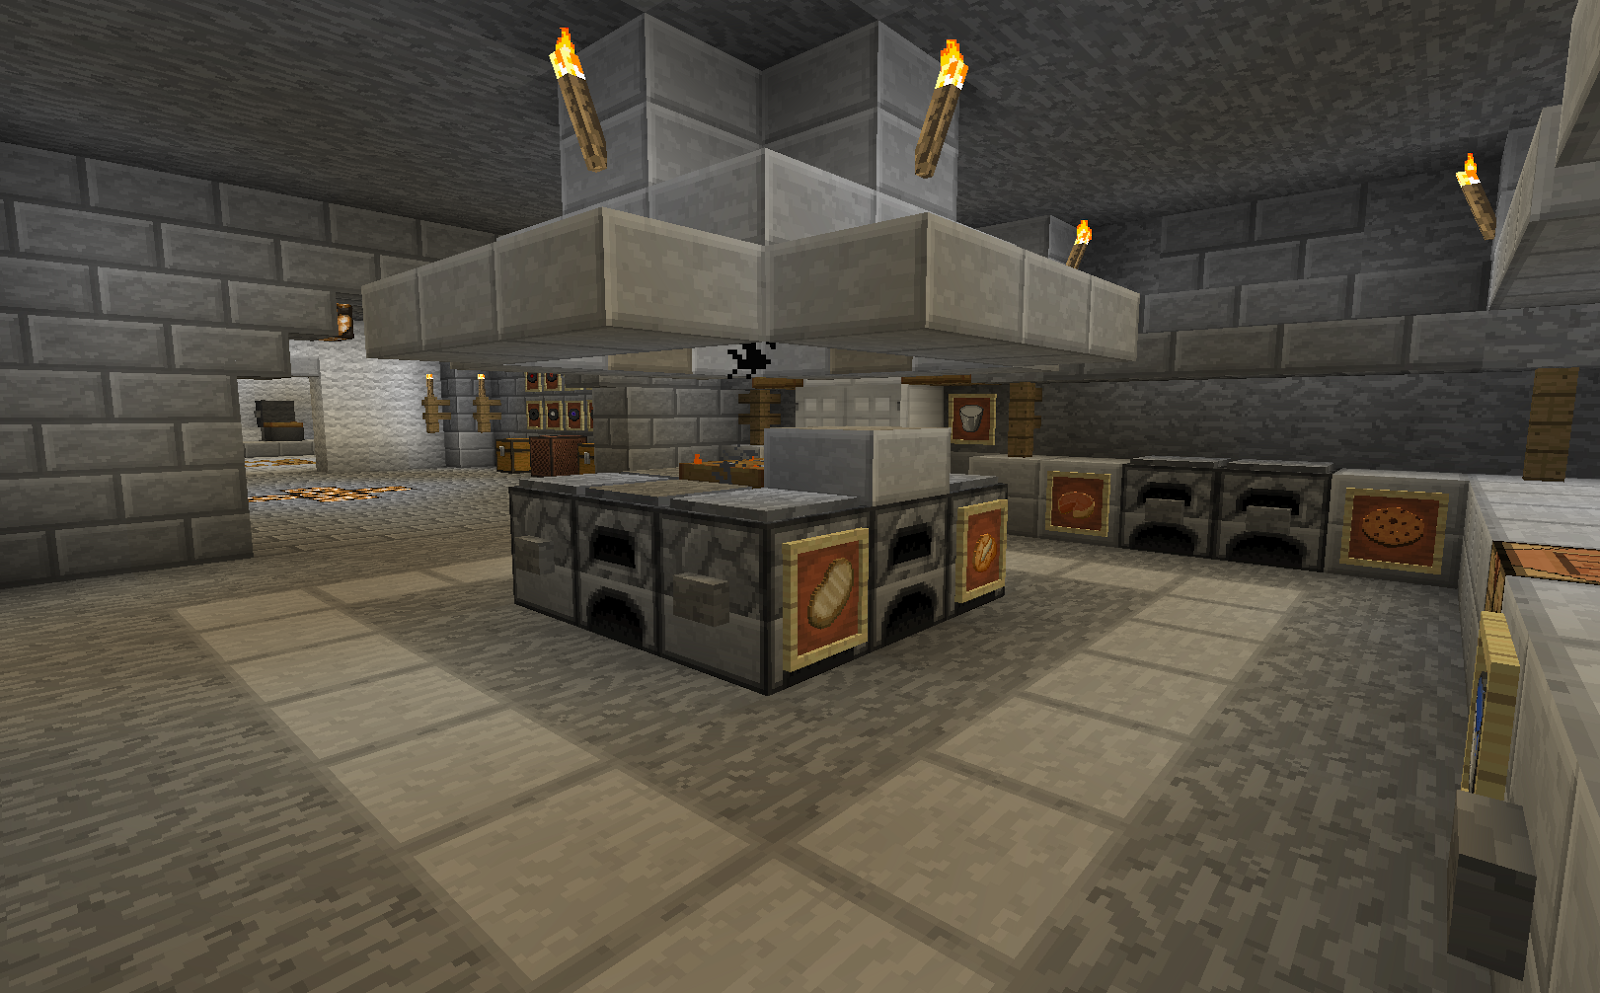 Minecraft projects minecraft kitchen with functional for Kitchen ideas minecraft